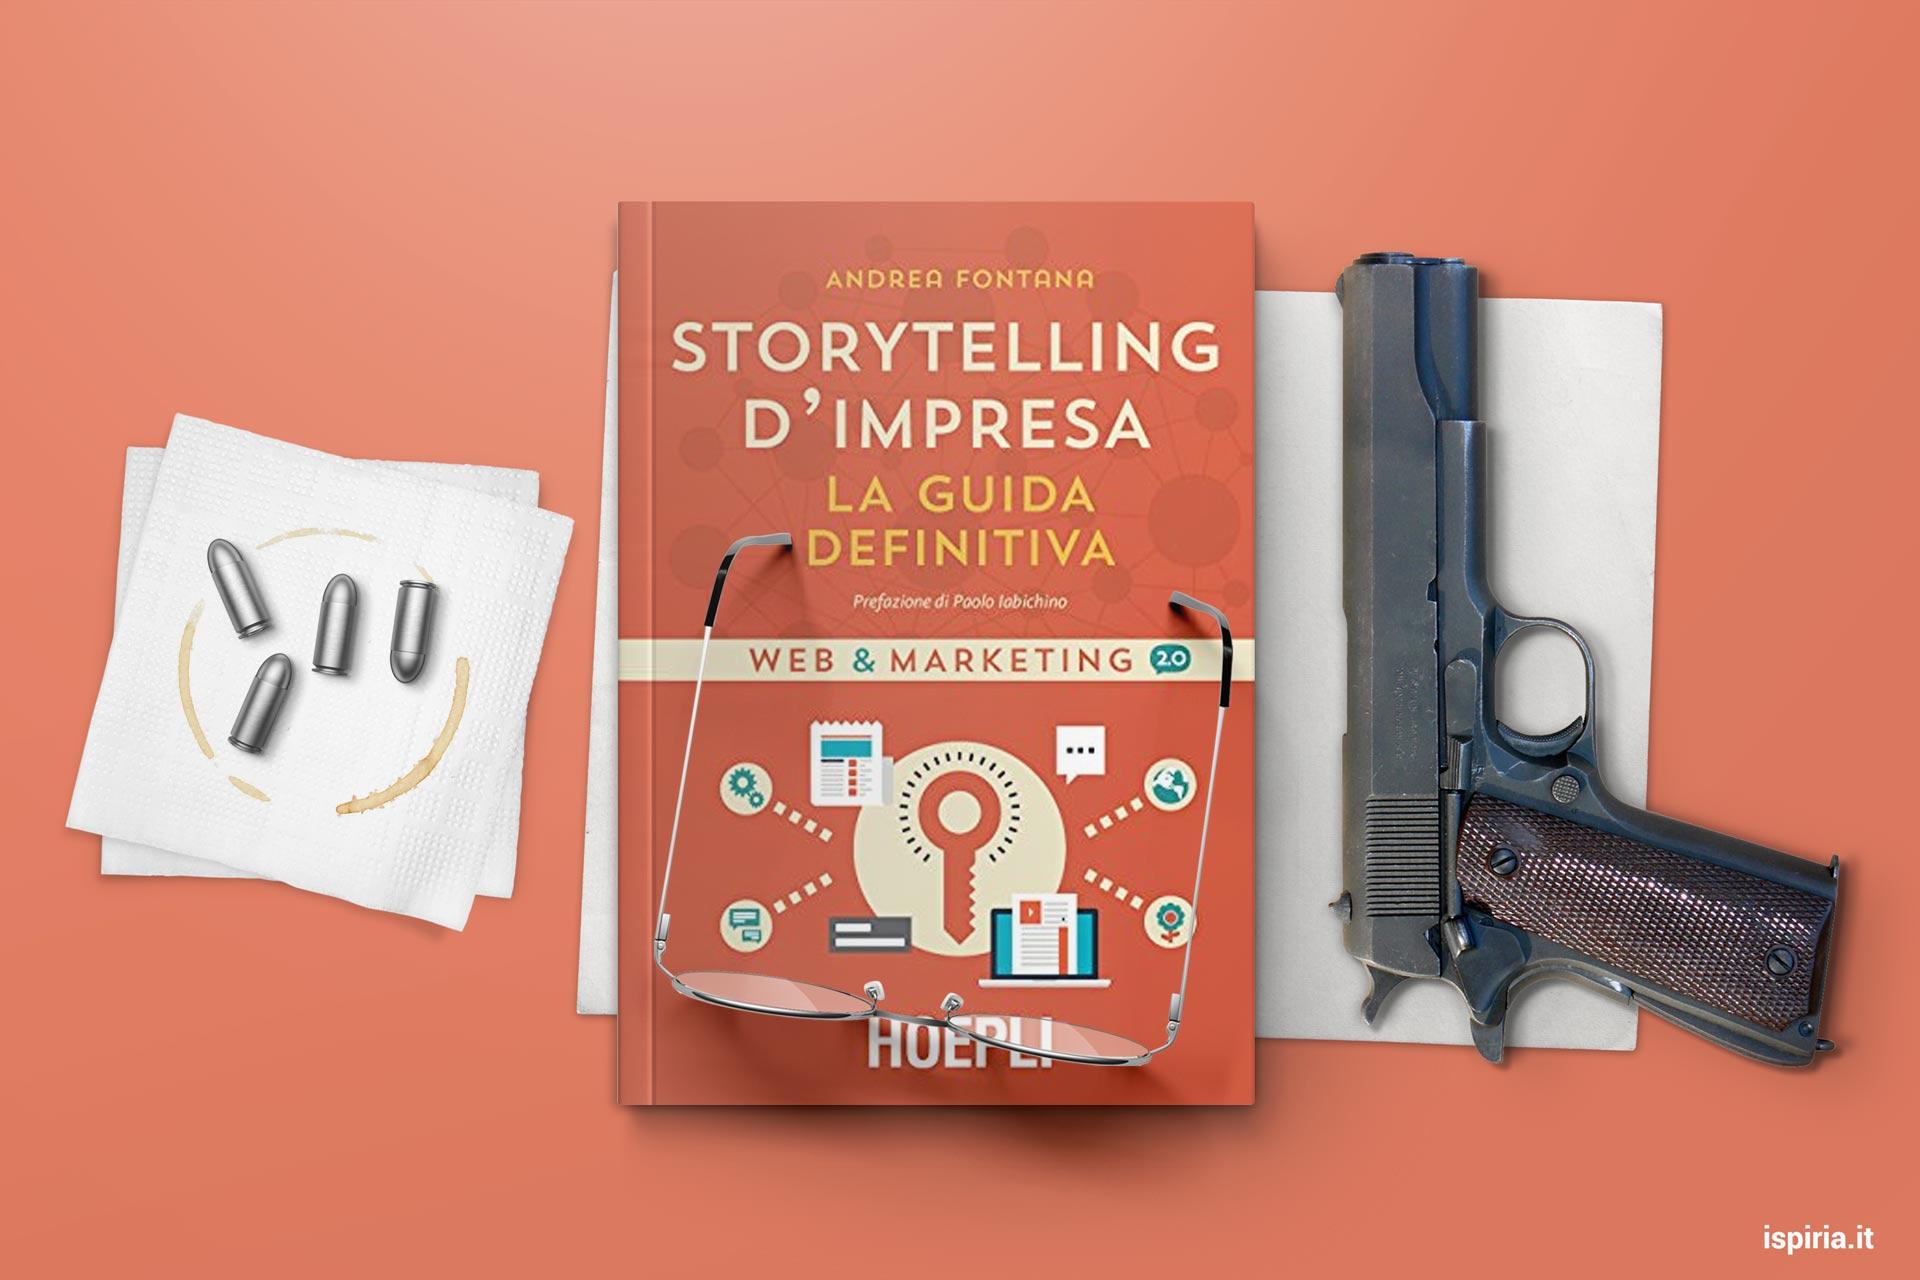 Storytelling-d'impresa-migliori-libro-sullo-storytelling-manuale